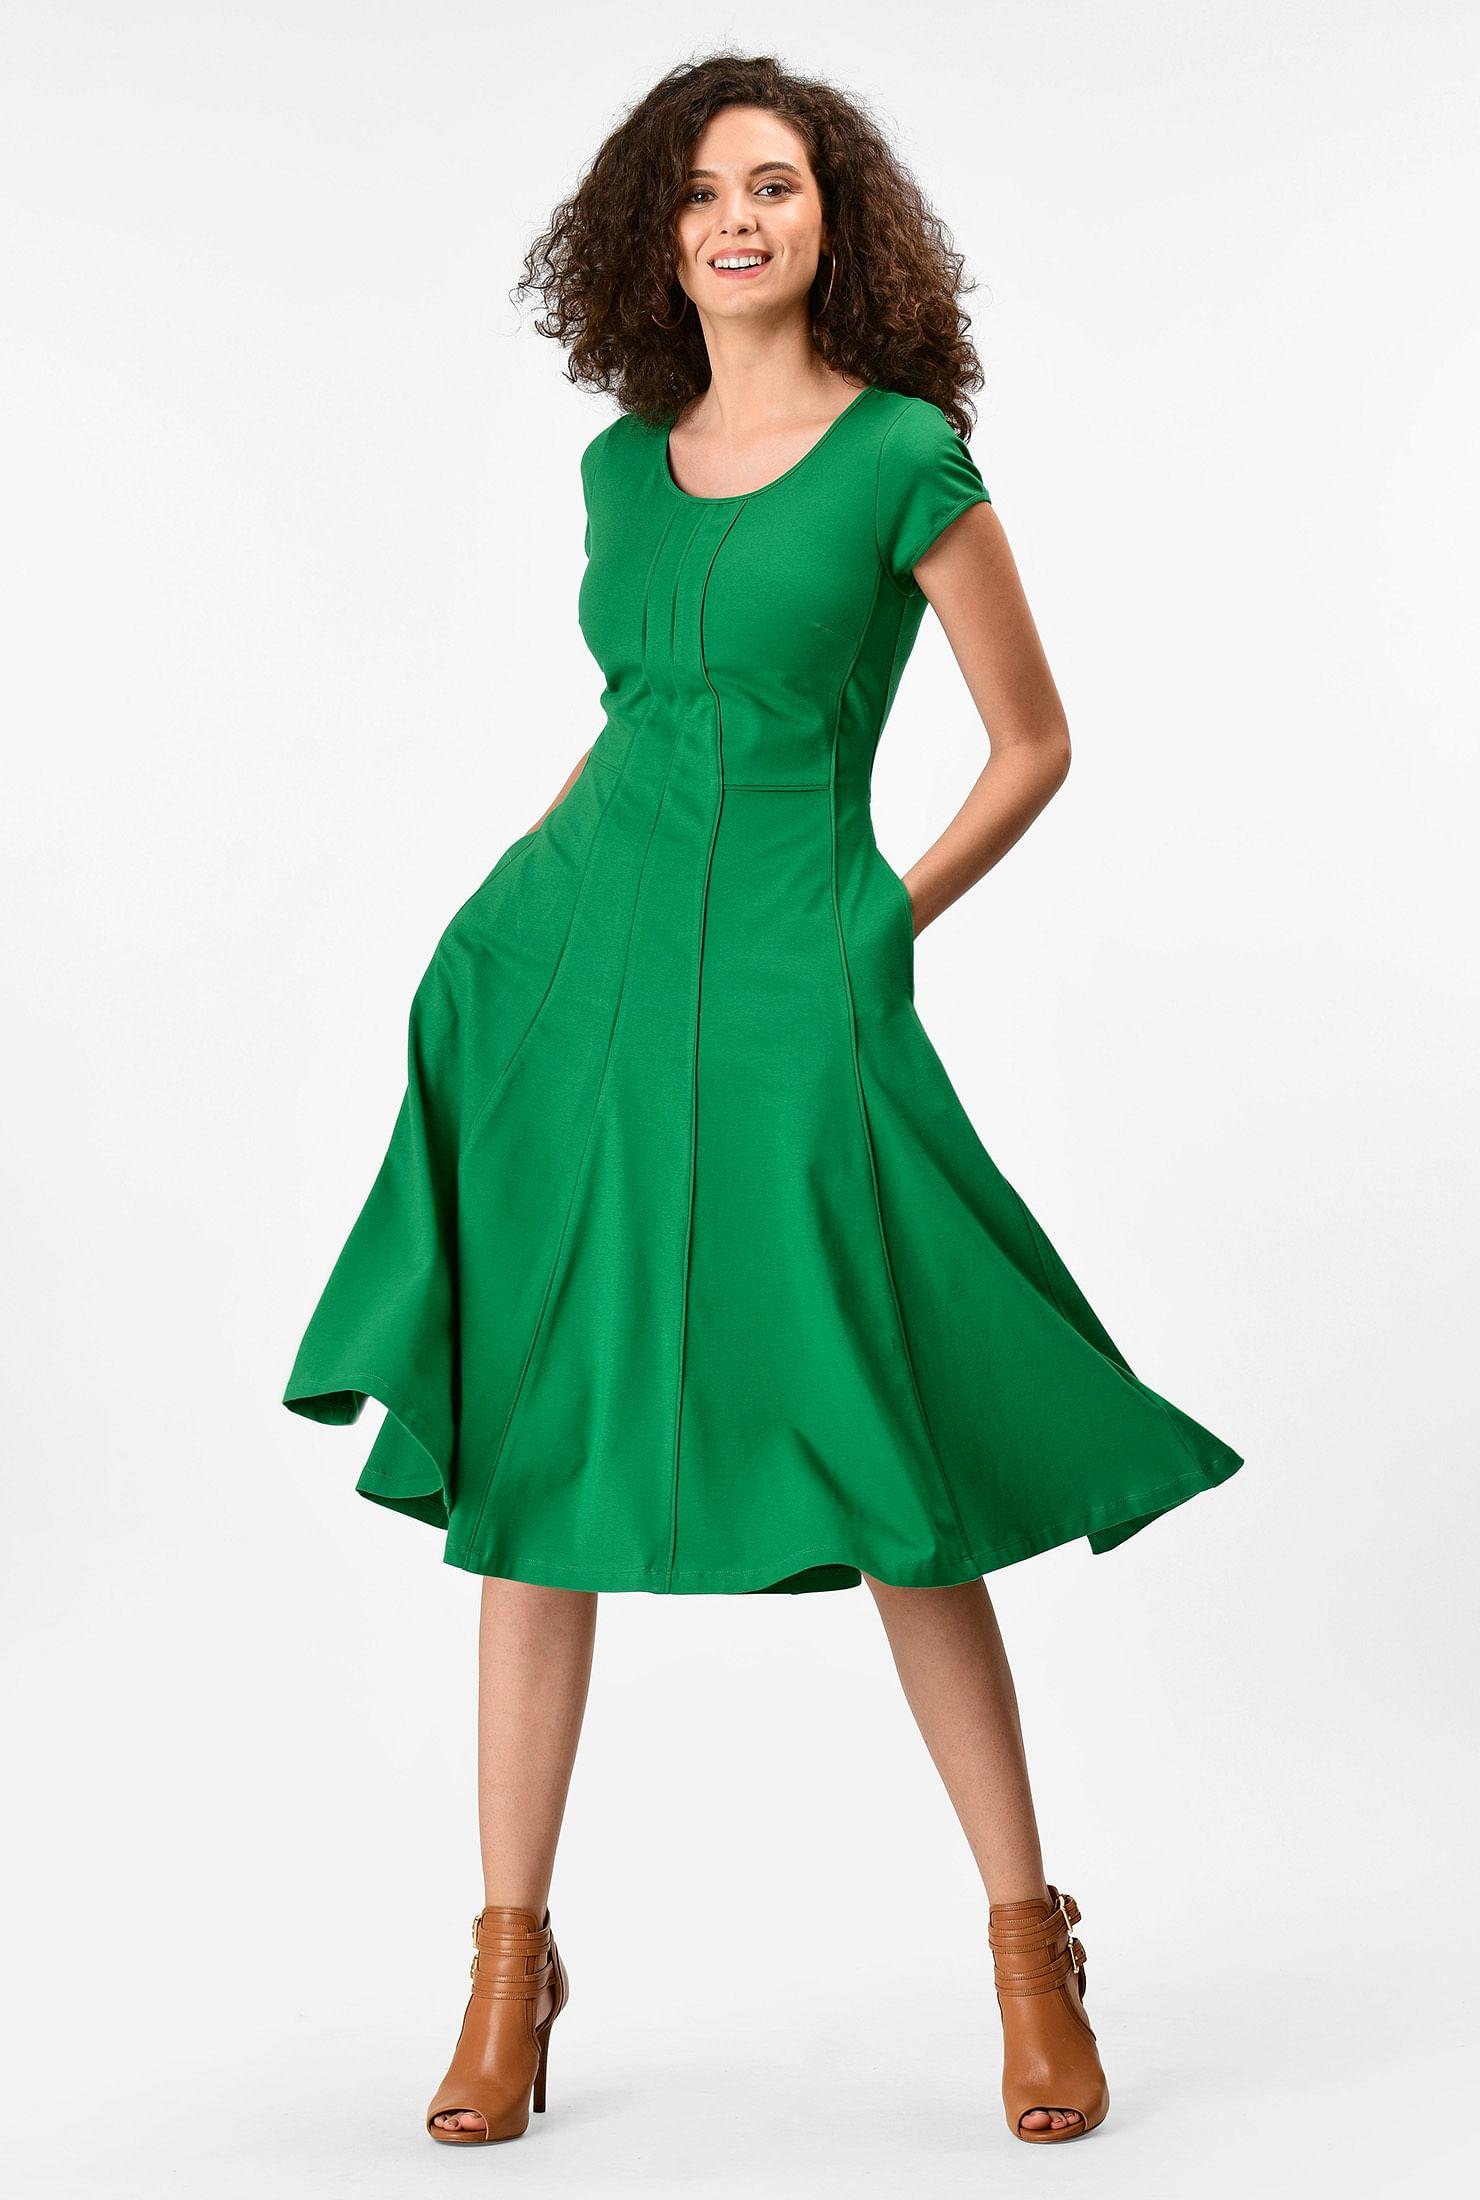 80fee14dc15 all-size inclusive dresses, casual event dresses, petites, plus size dresses